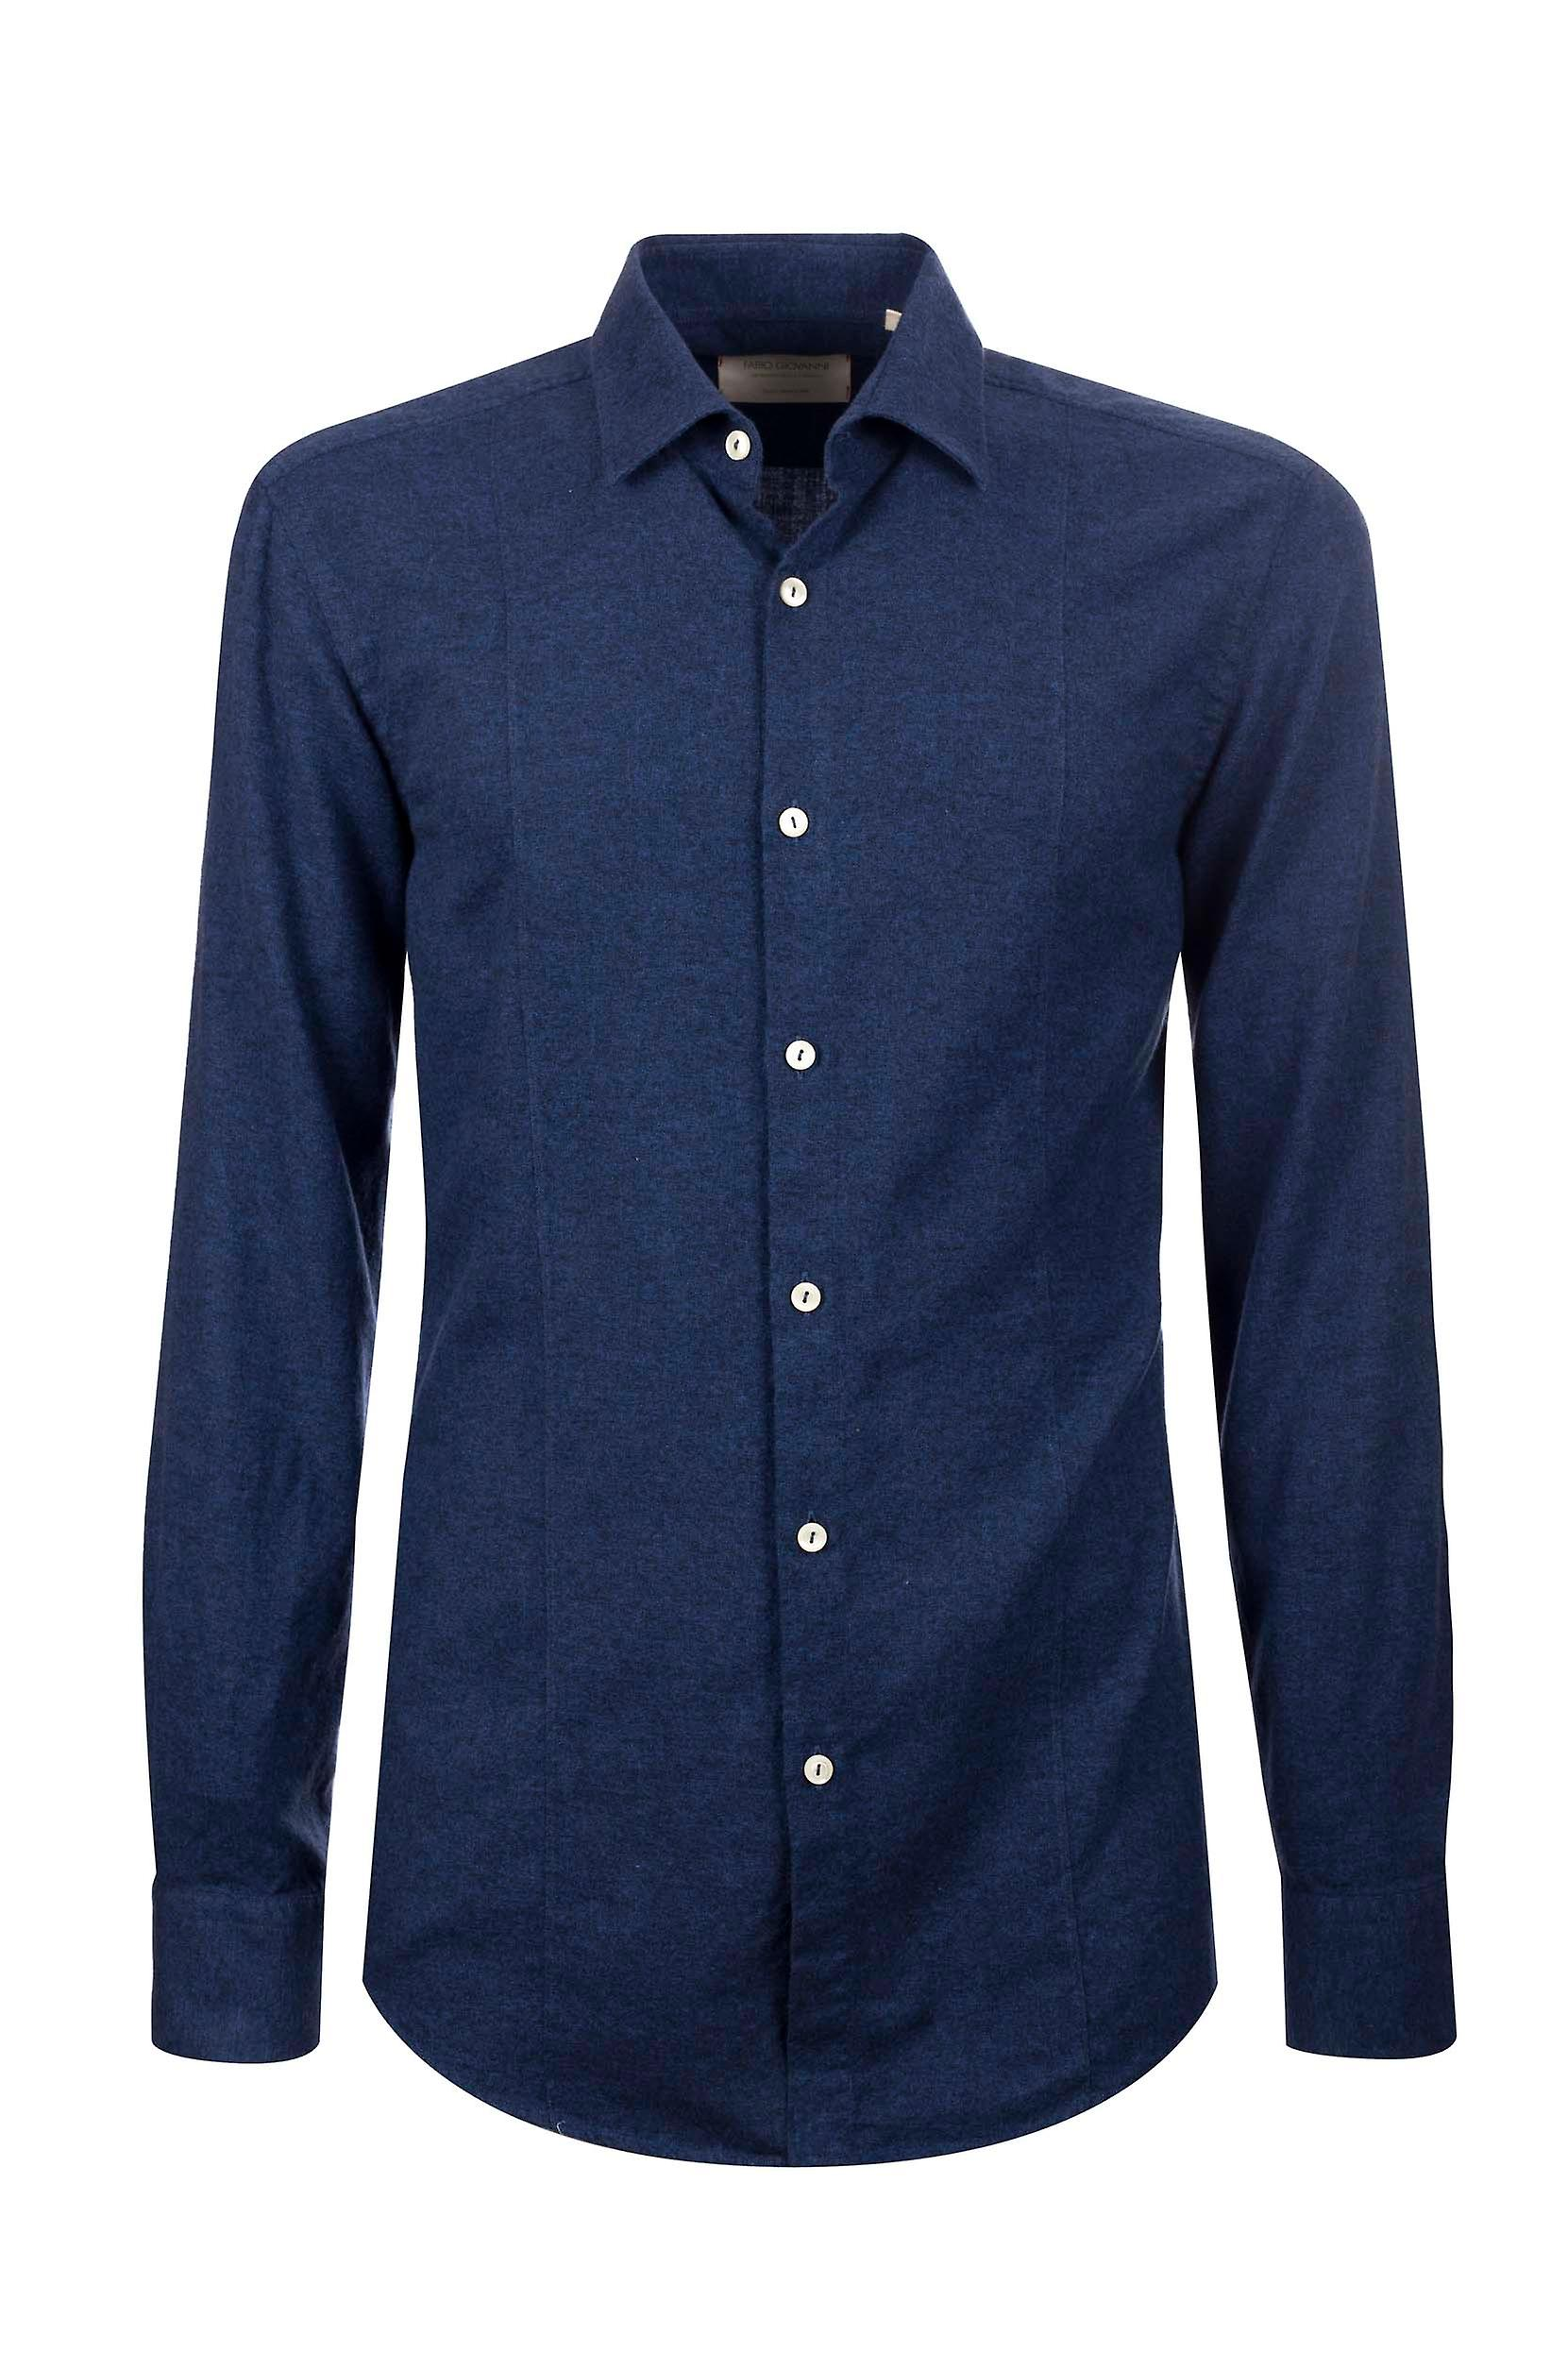 Fabio Giovanni Umberto Shirt - Super-Soft Cotton Flannel Blue Italian Shirt